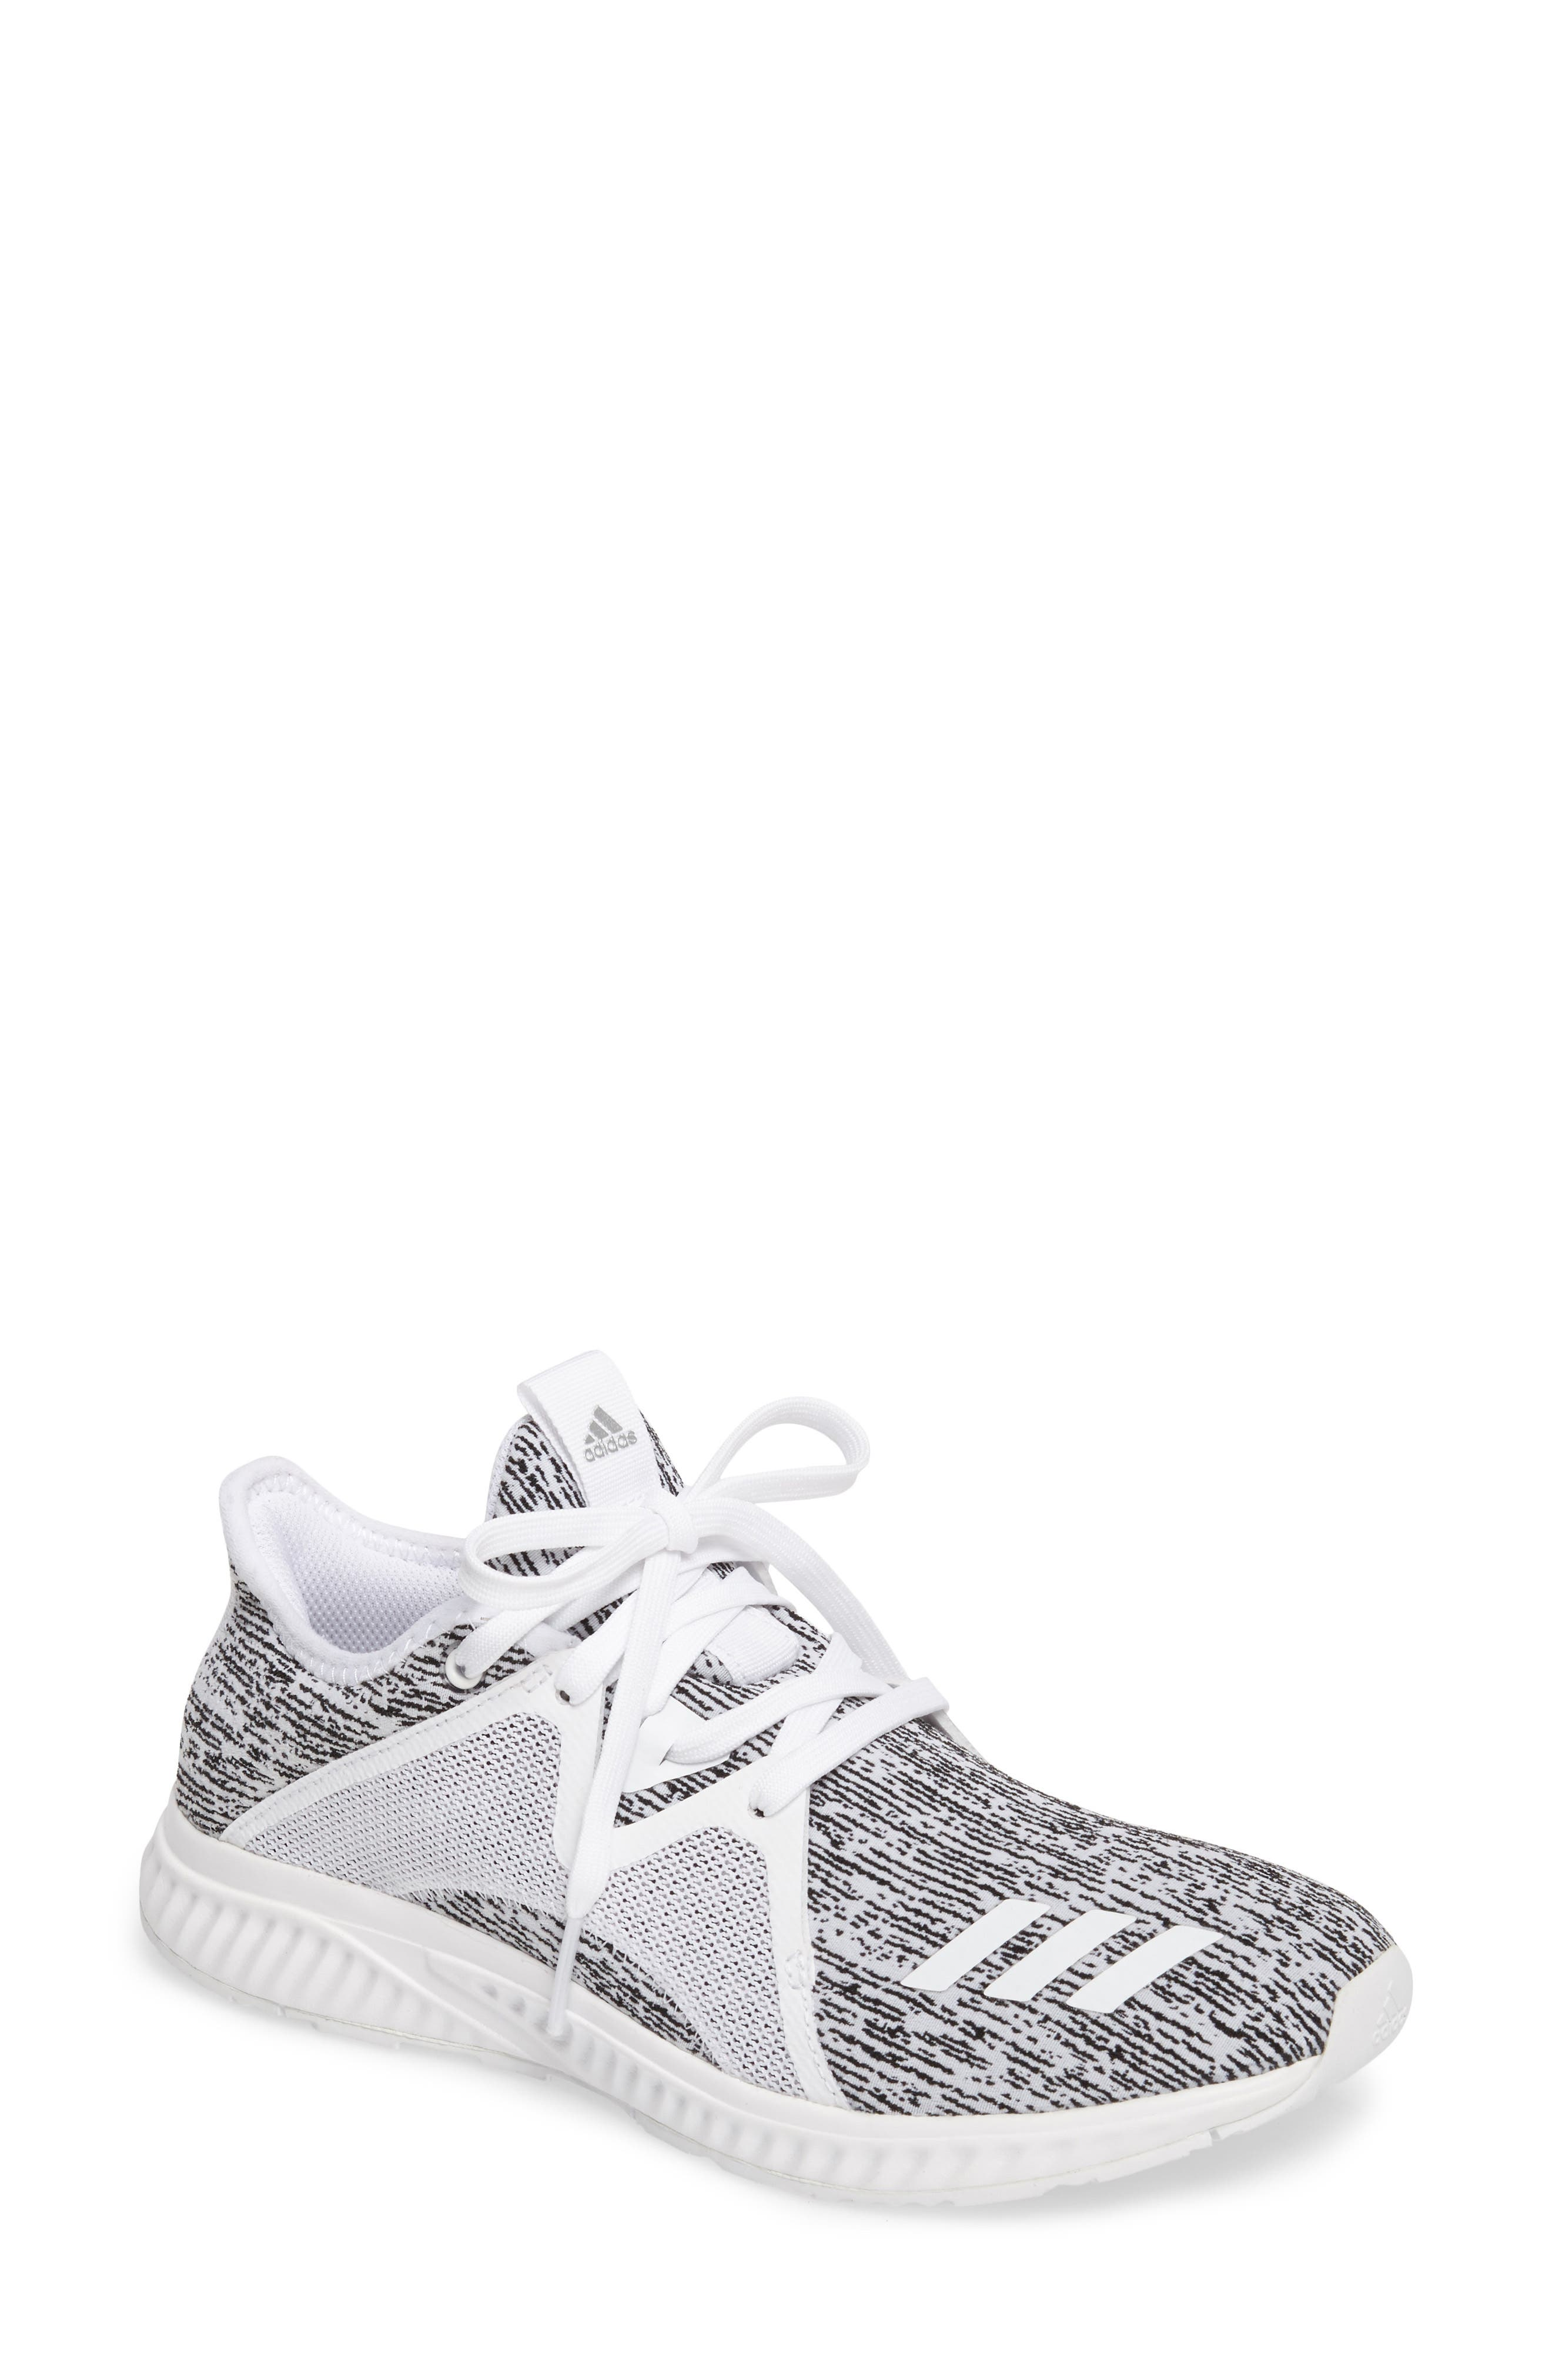 adidas Edge Lux 2.0 Running Shoe (Women)